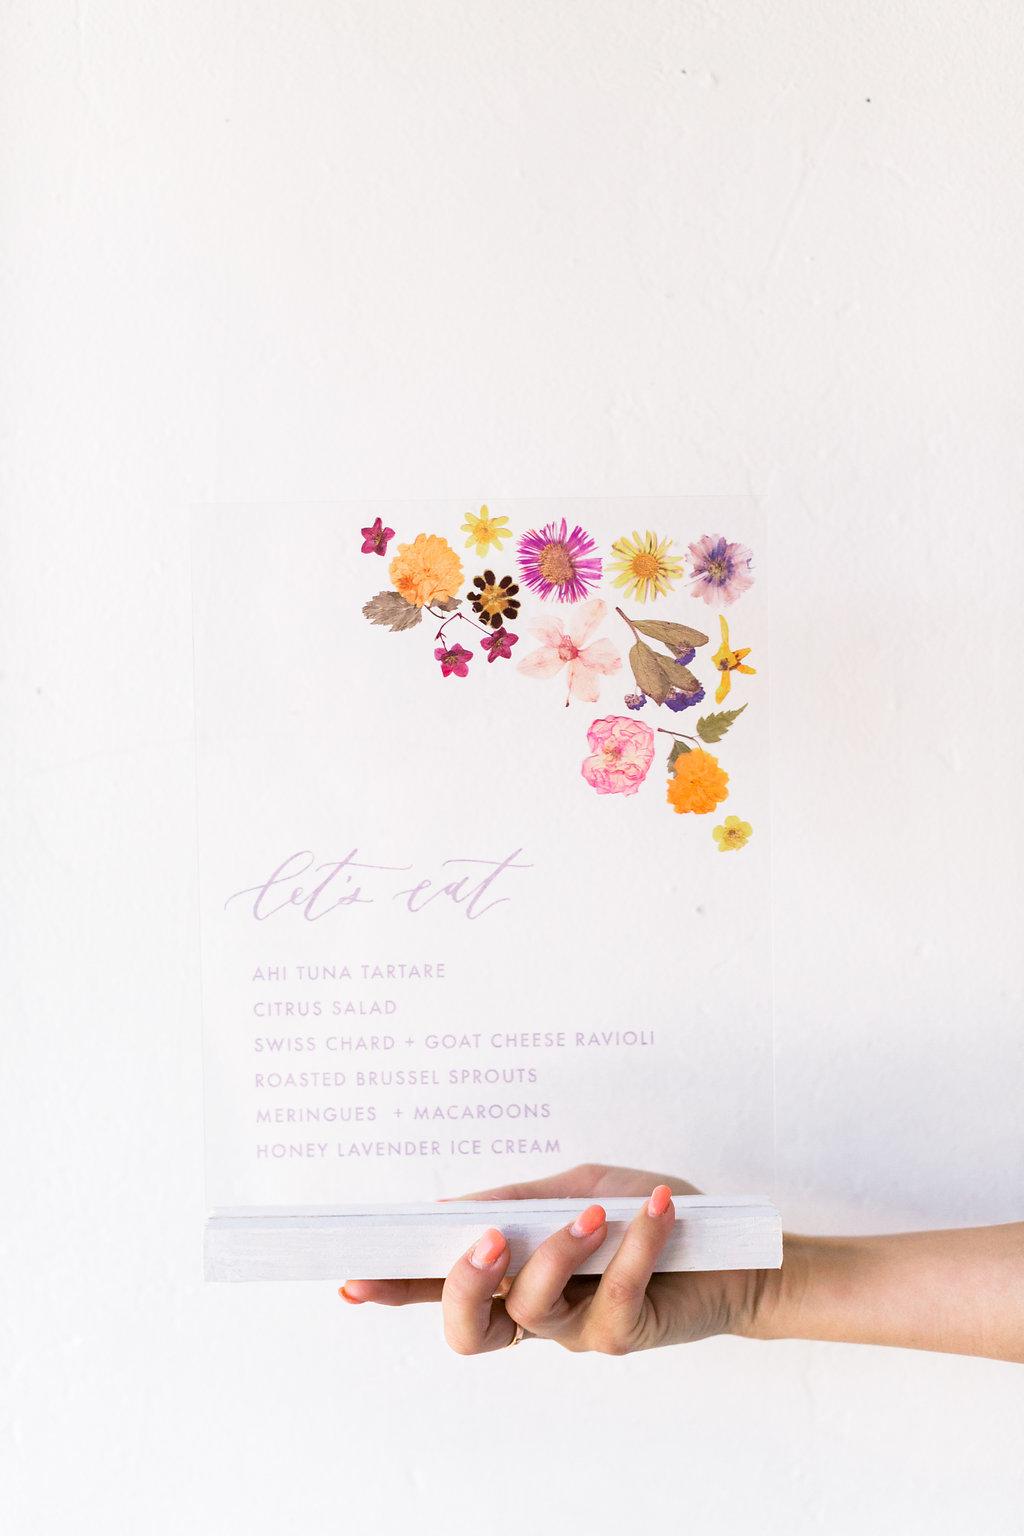 FloralBrickWeddingEditorial-NatalieSchuttPhotography-99 copy.JPG